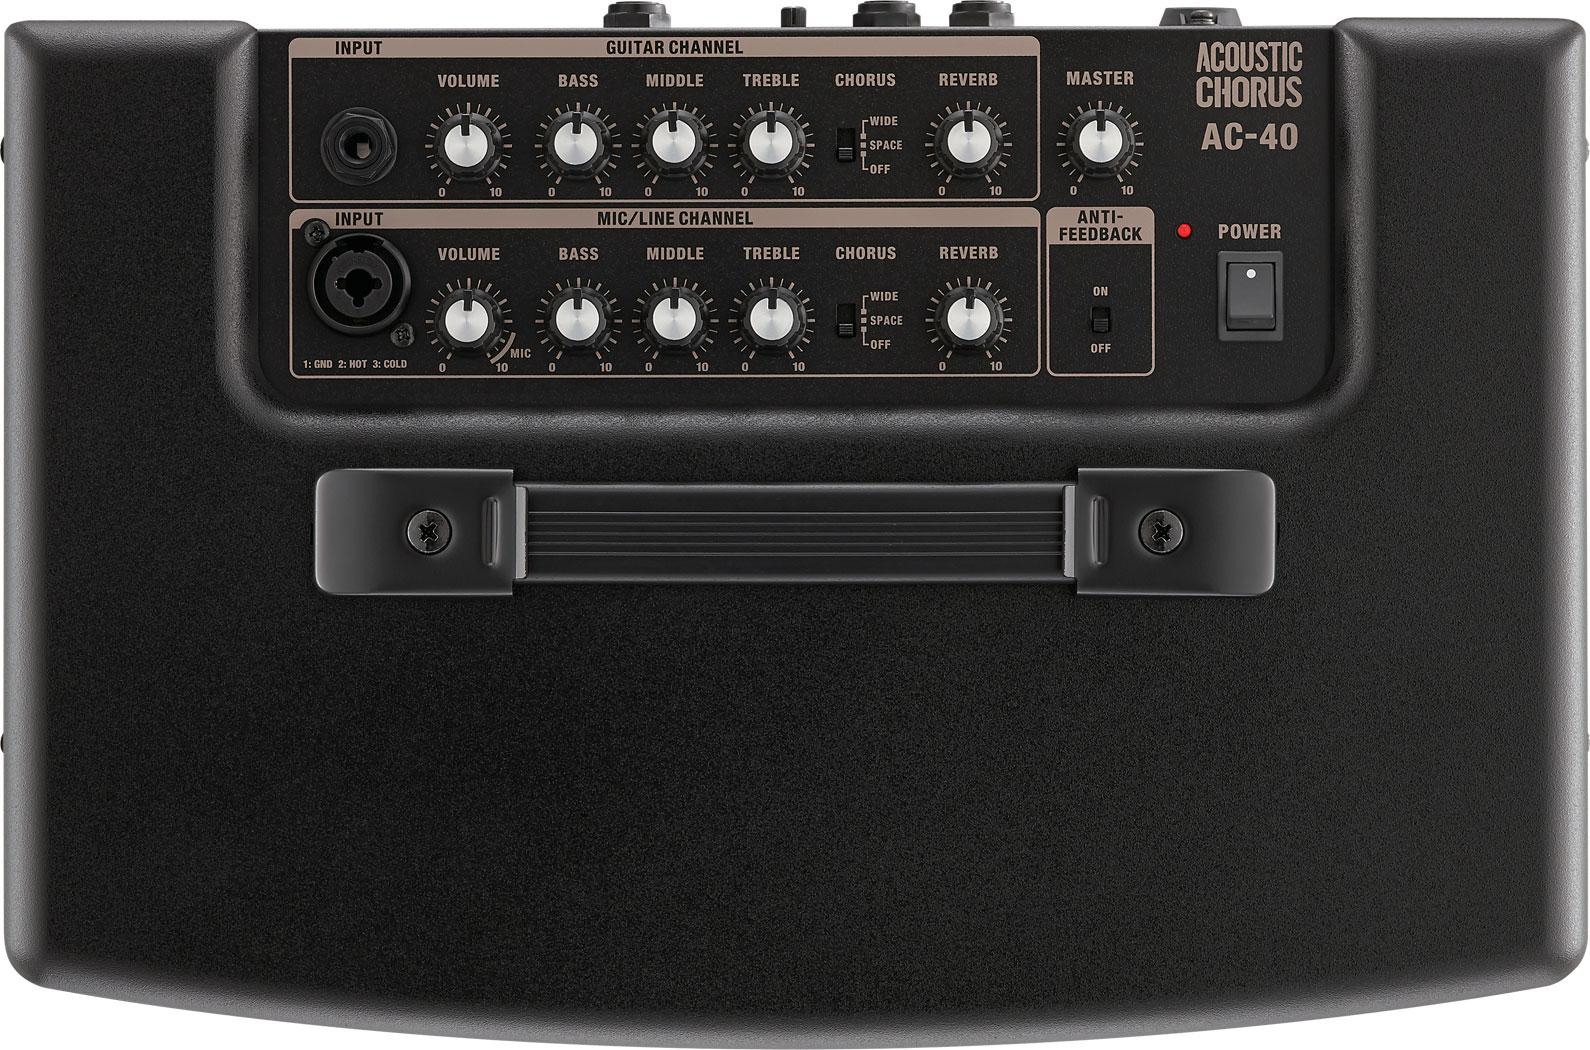 Roland AC-40 Top Panel